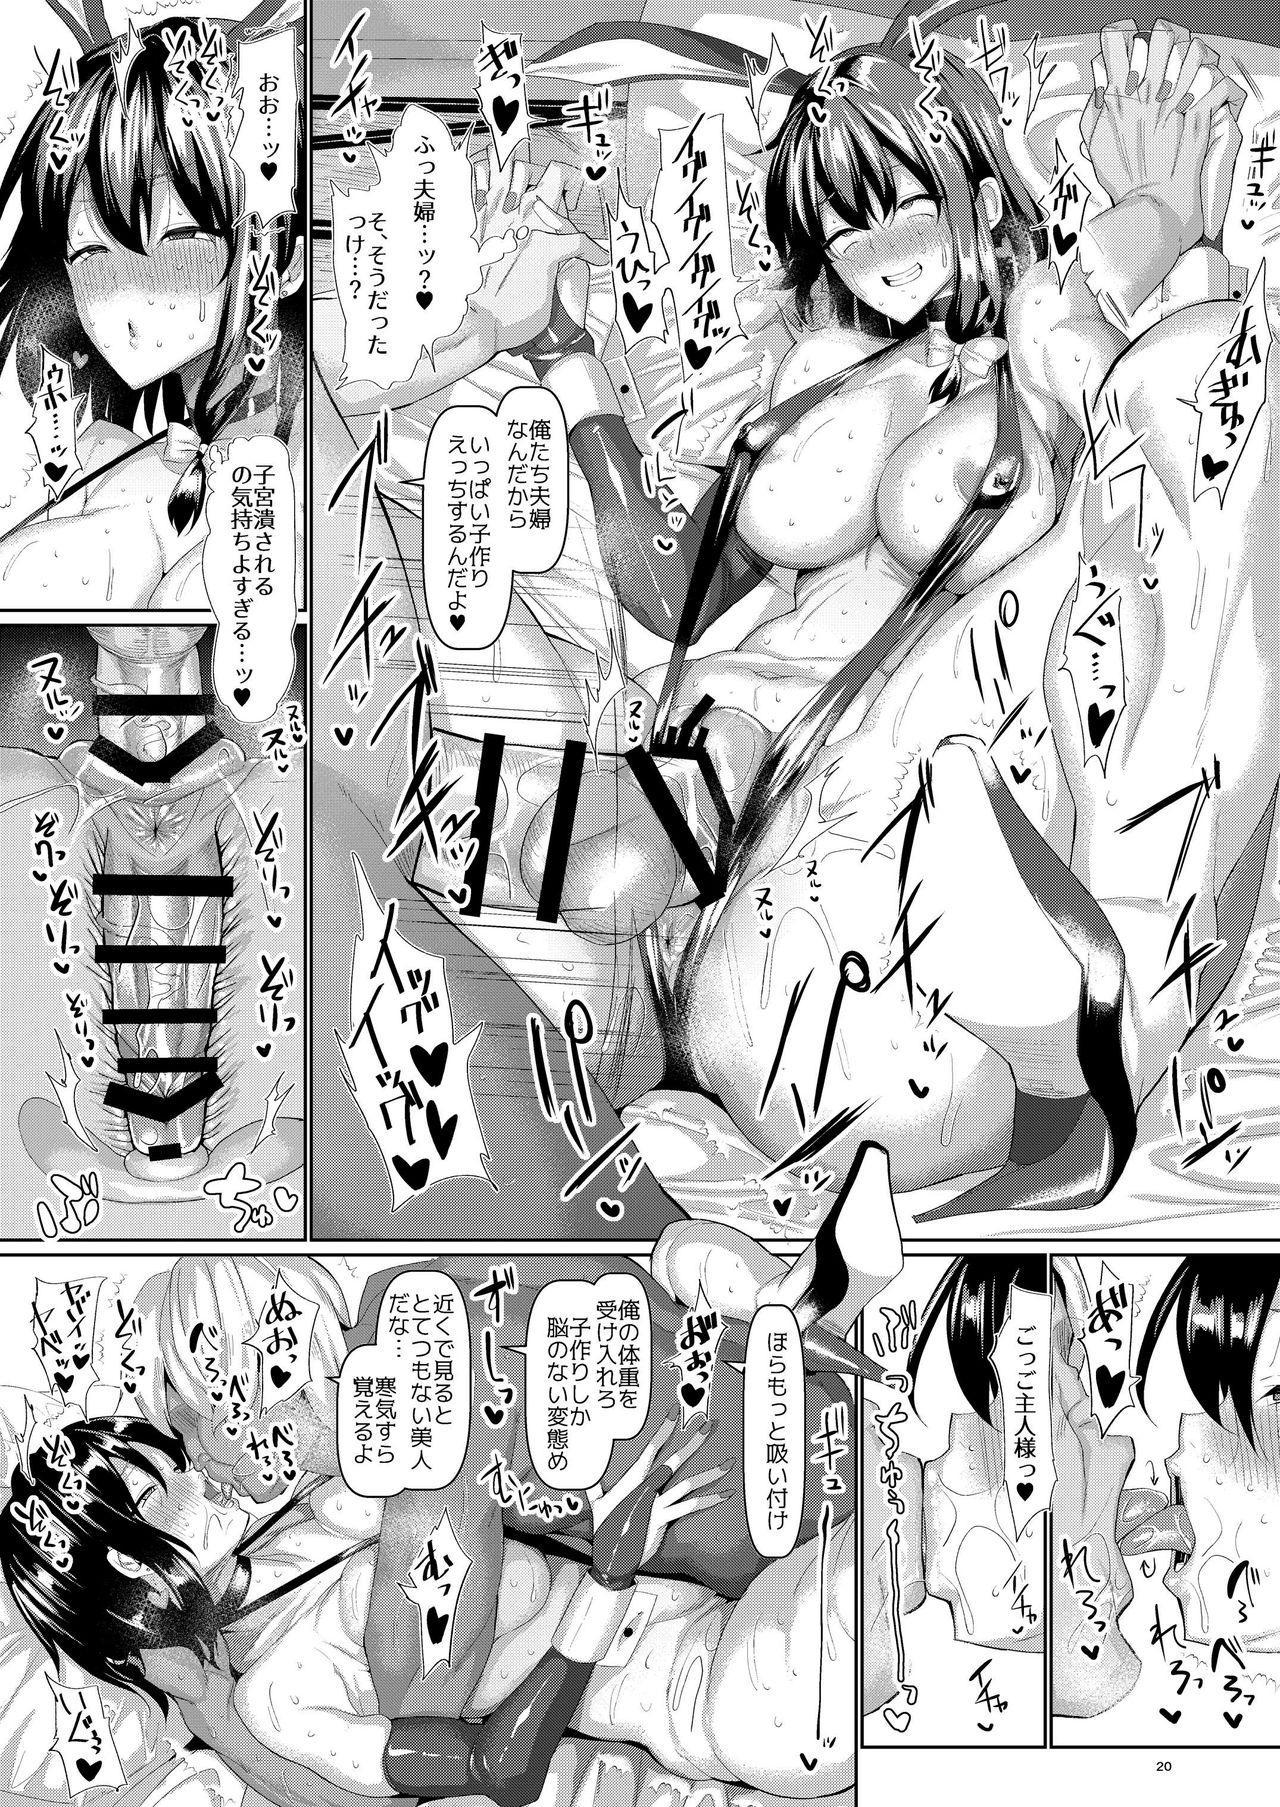 Renko Sennyuu! Saimin Bunny Girl 21